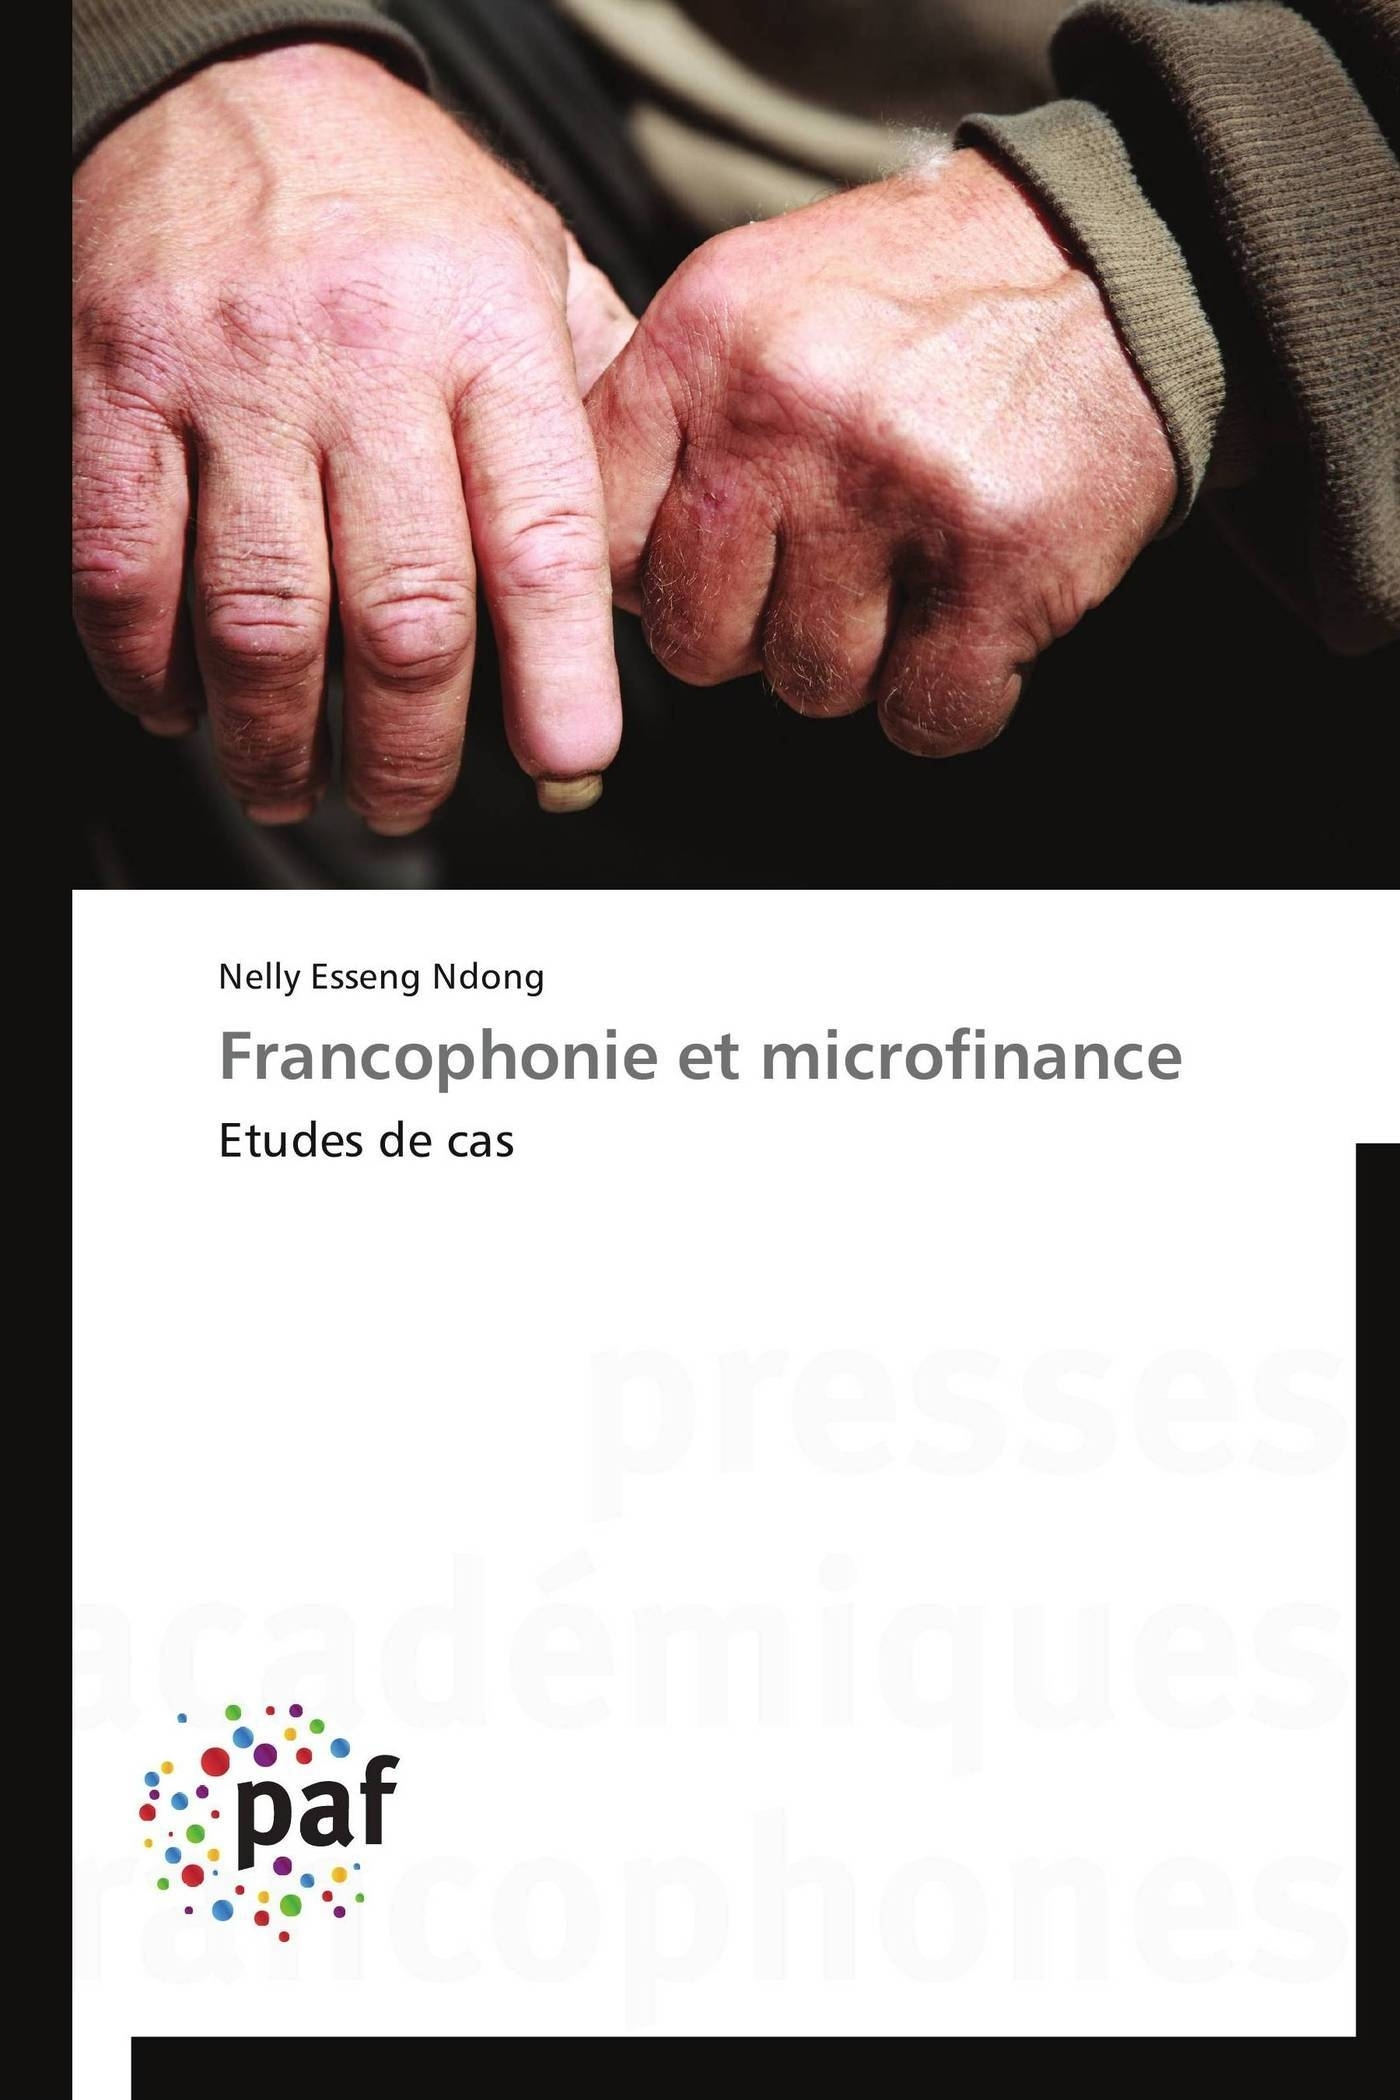 FRANCOPHONIE ET MICROFINANCE